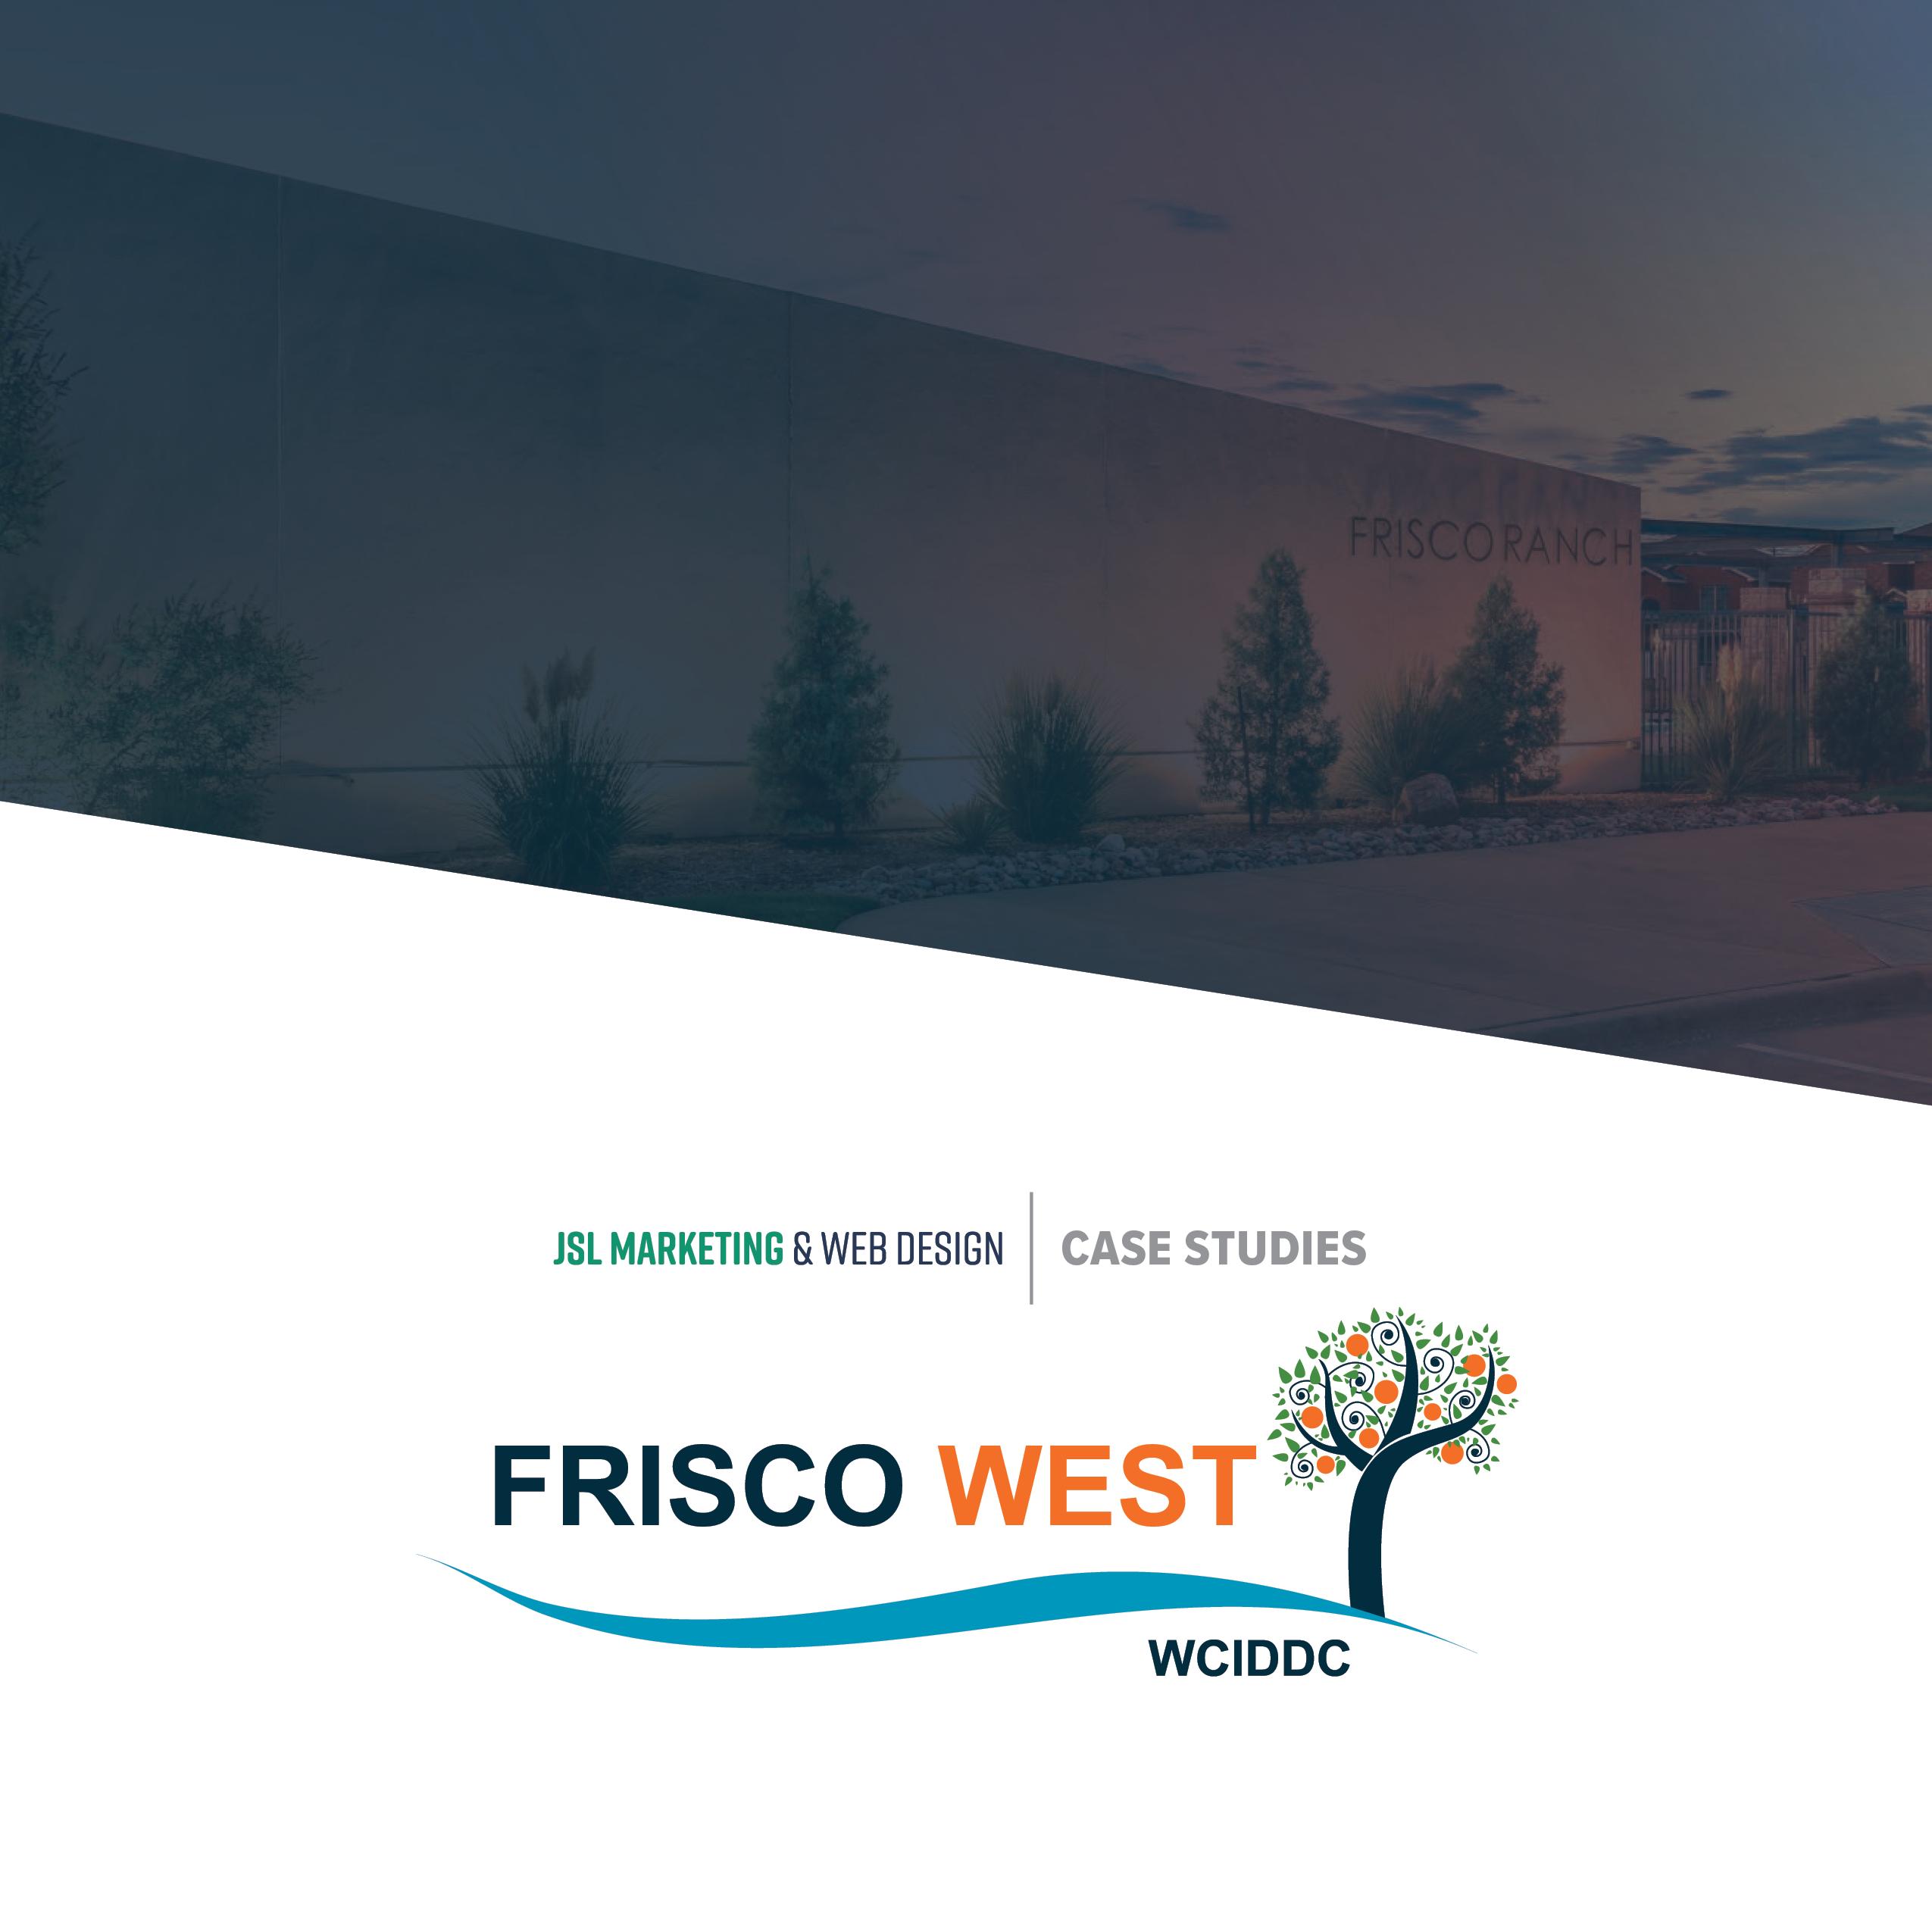 Frisco west branding case study